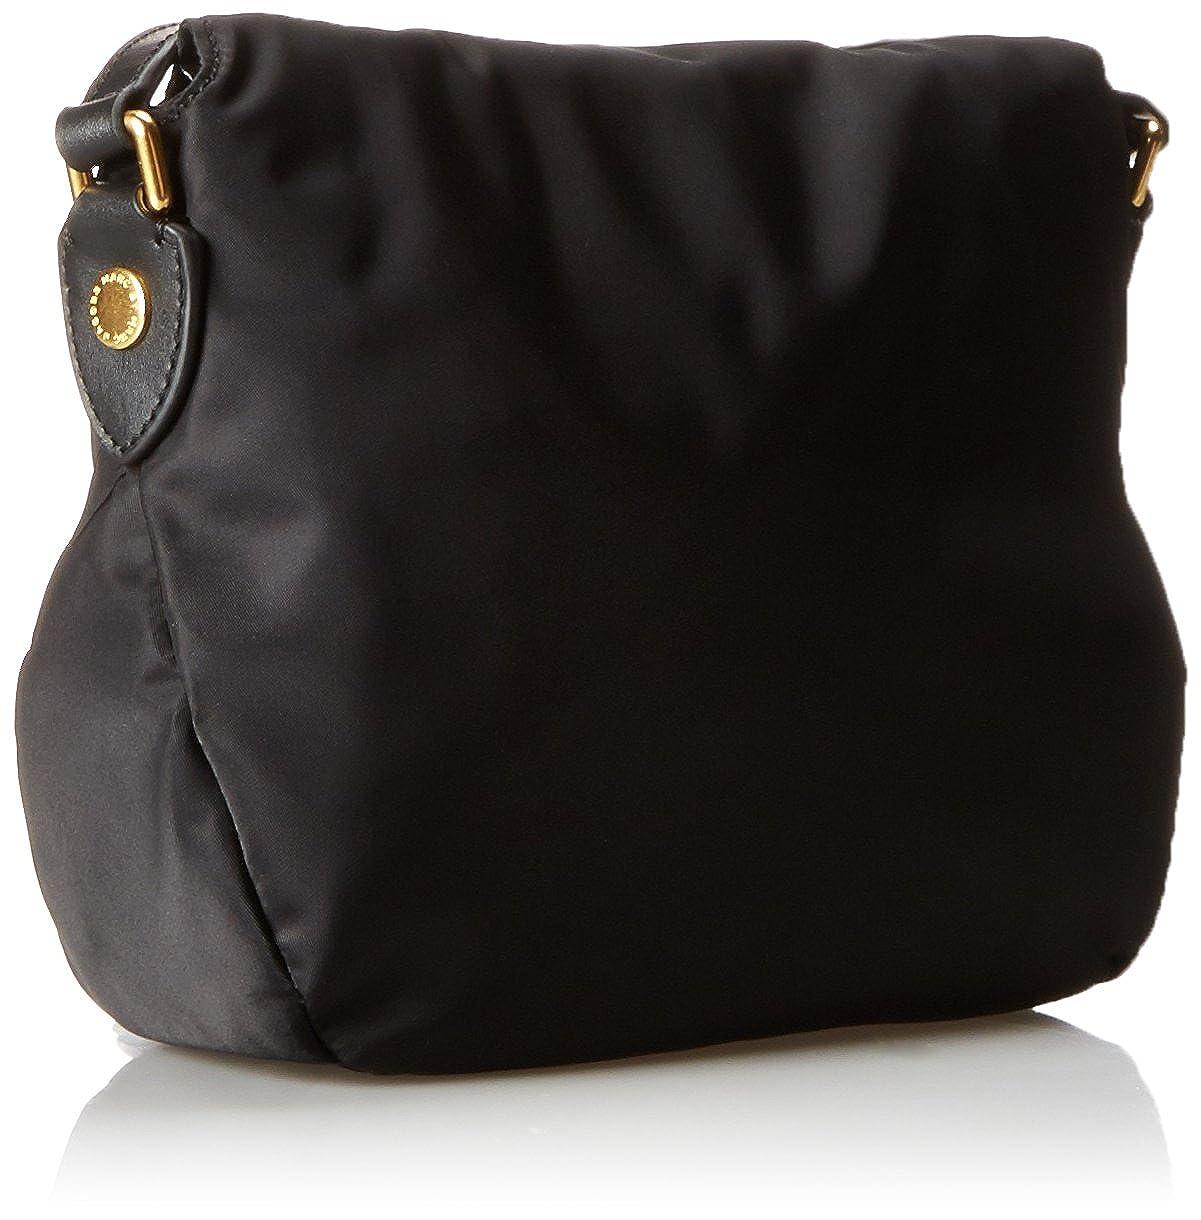 b584d06b05 Marc by Marc Jacobs Preppy Nylon Mini Natasha Cross Body Bag Black One Size